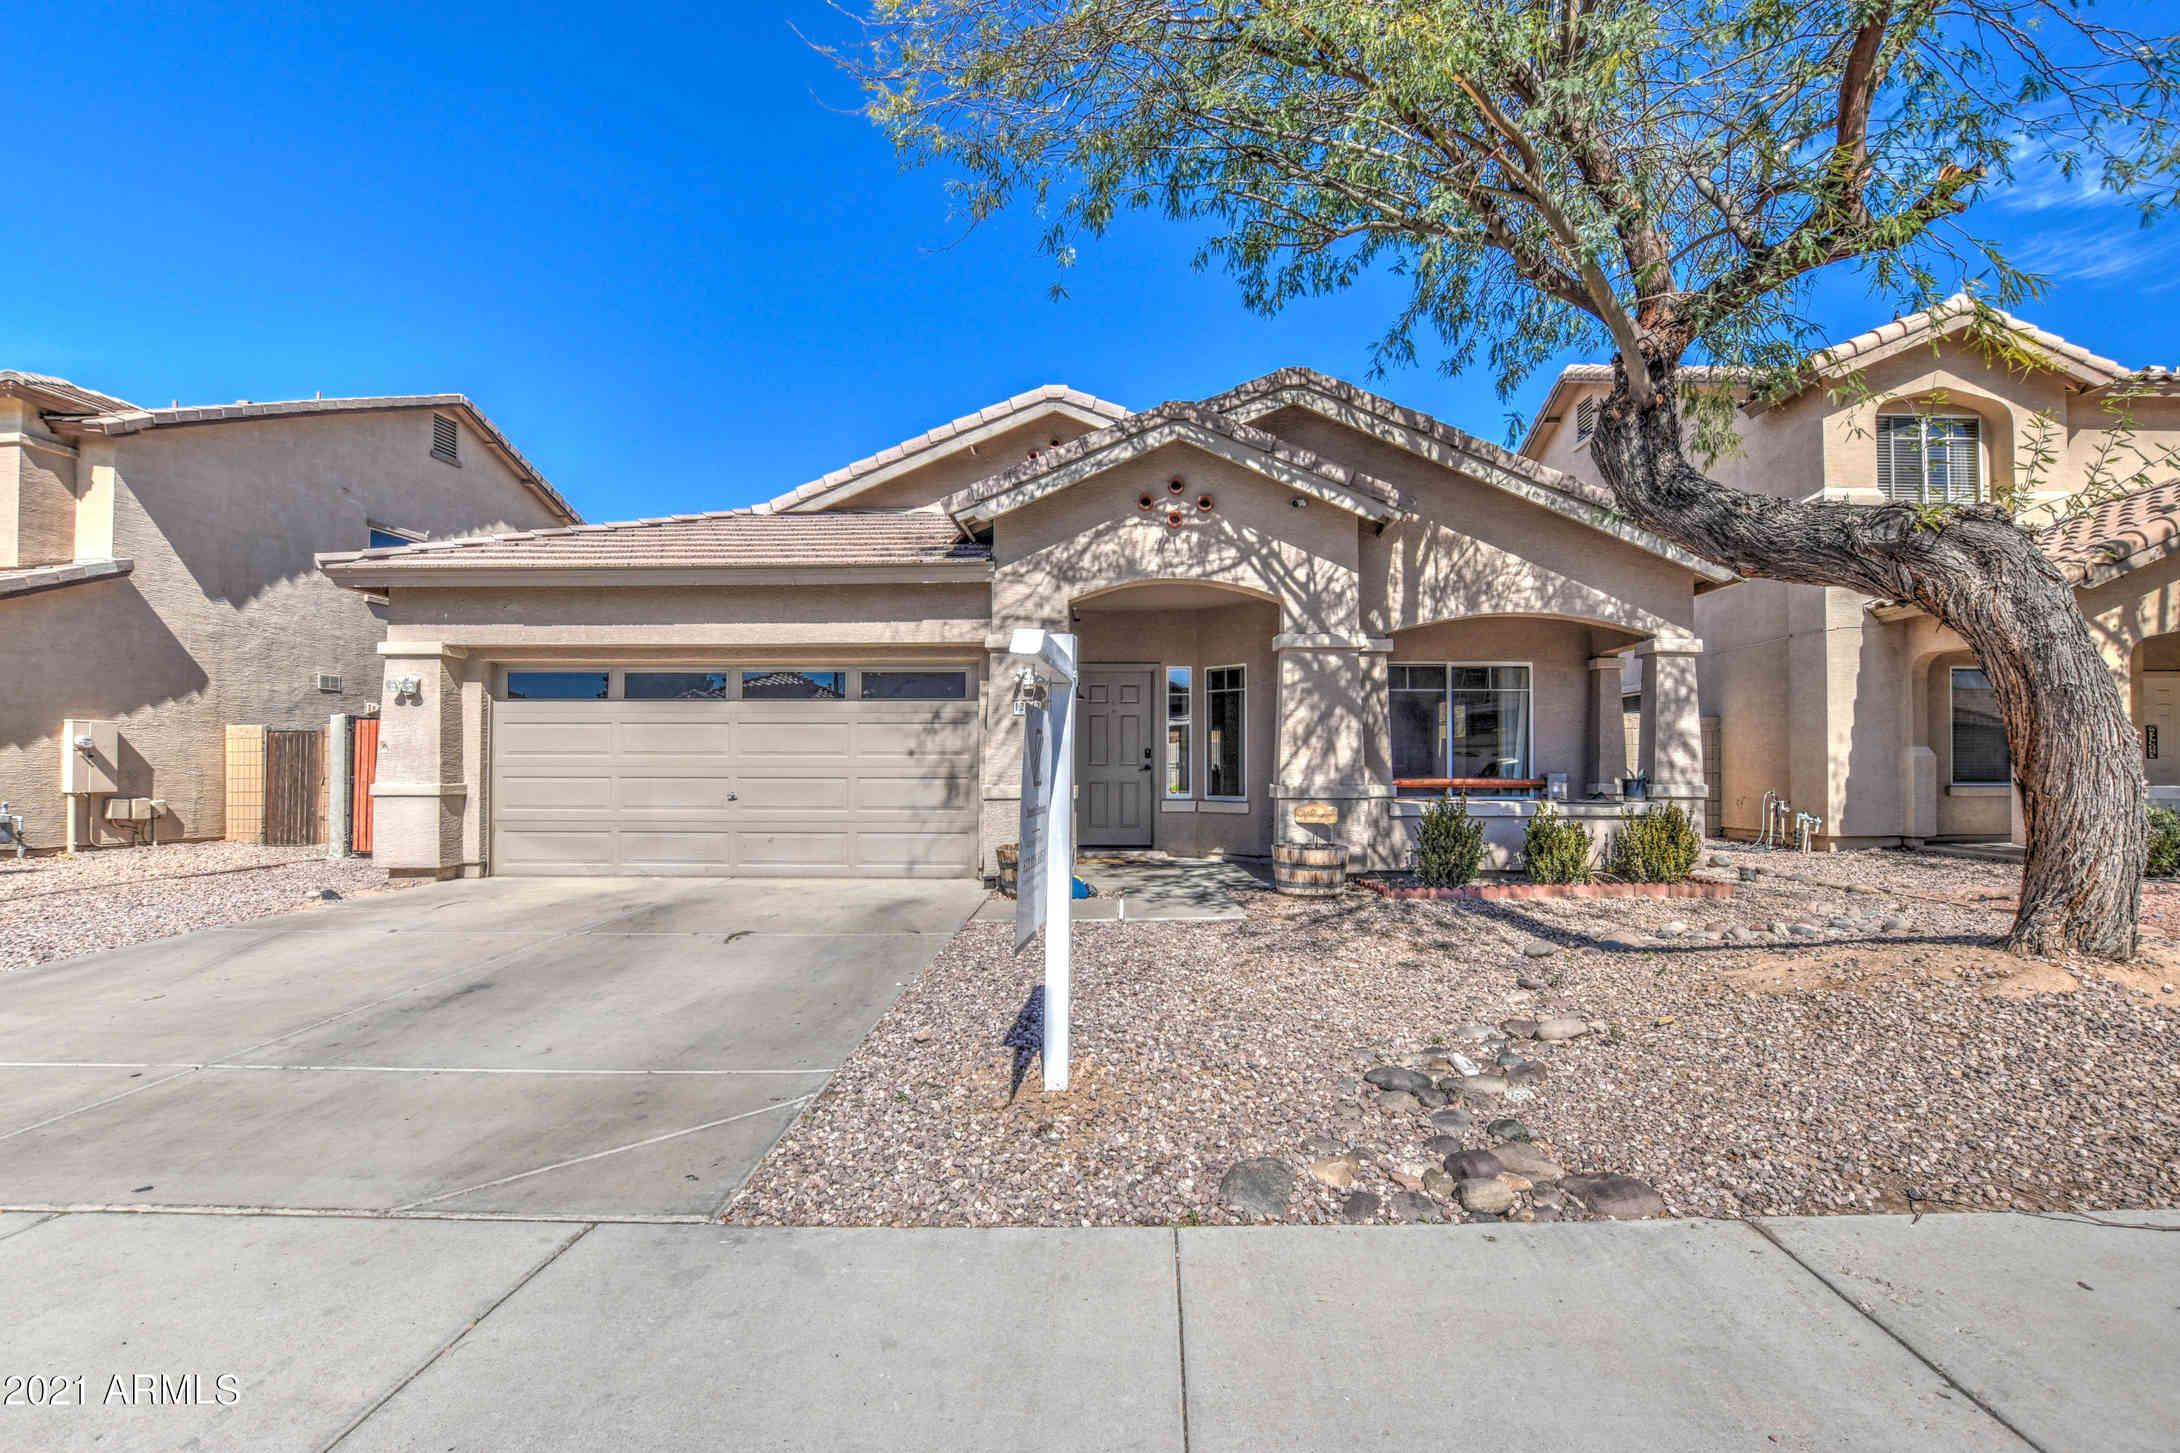 12242 W WASHINGTON Street, Avondale, AZ, 85323,